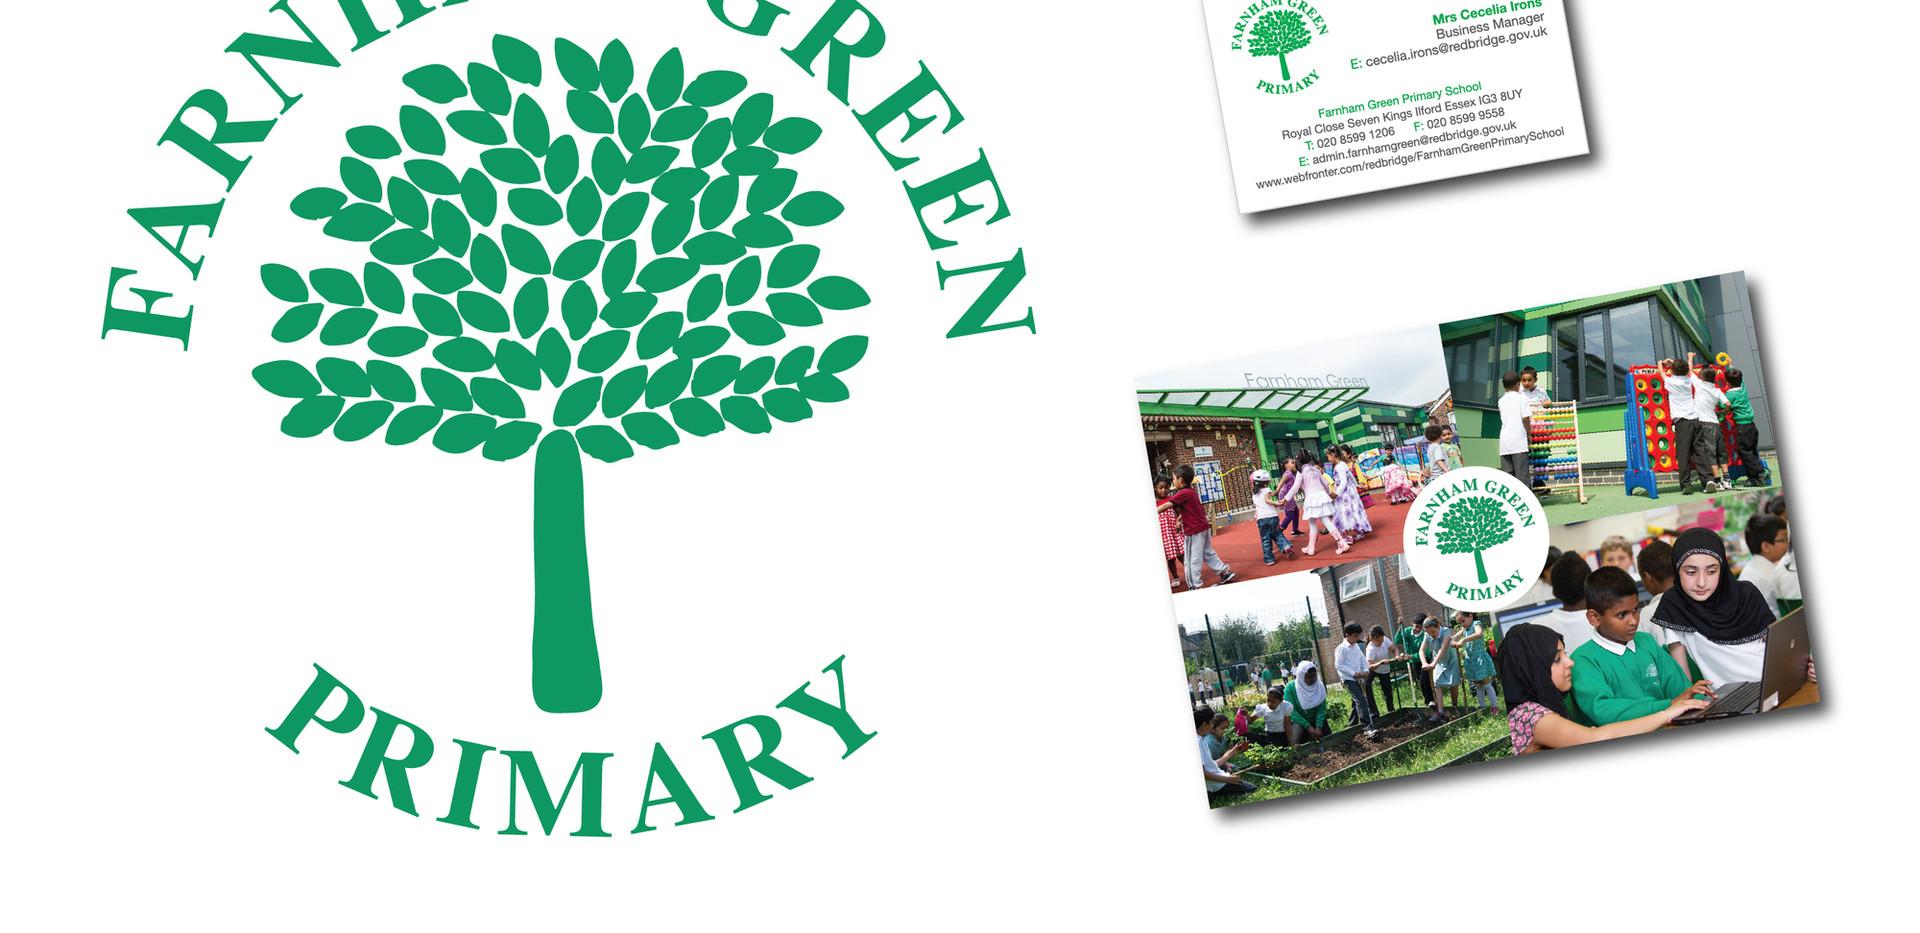 Farnham Green Primary School